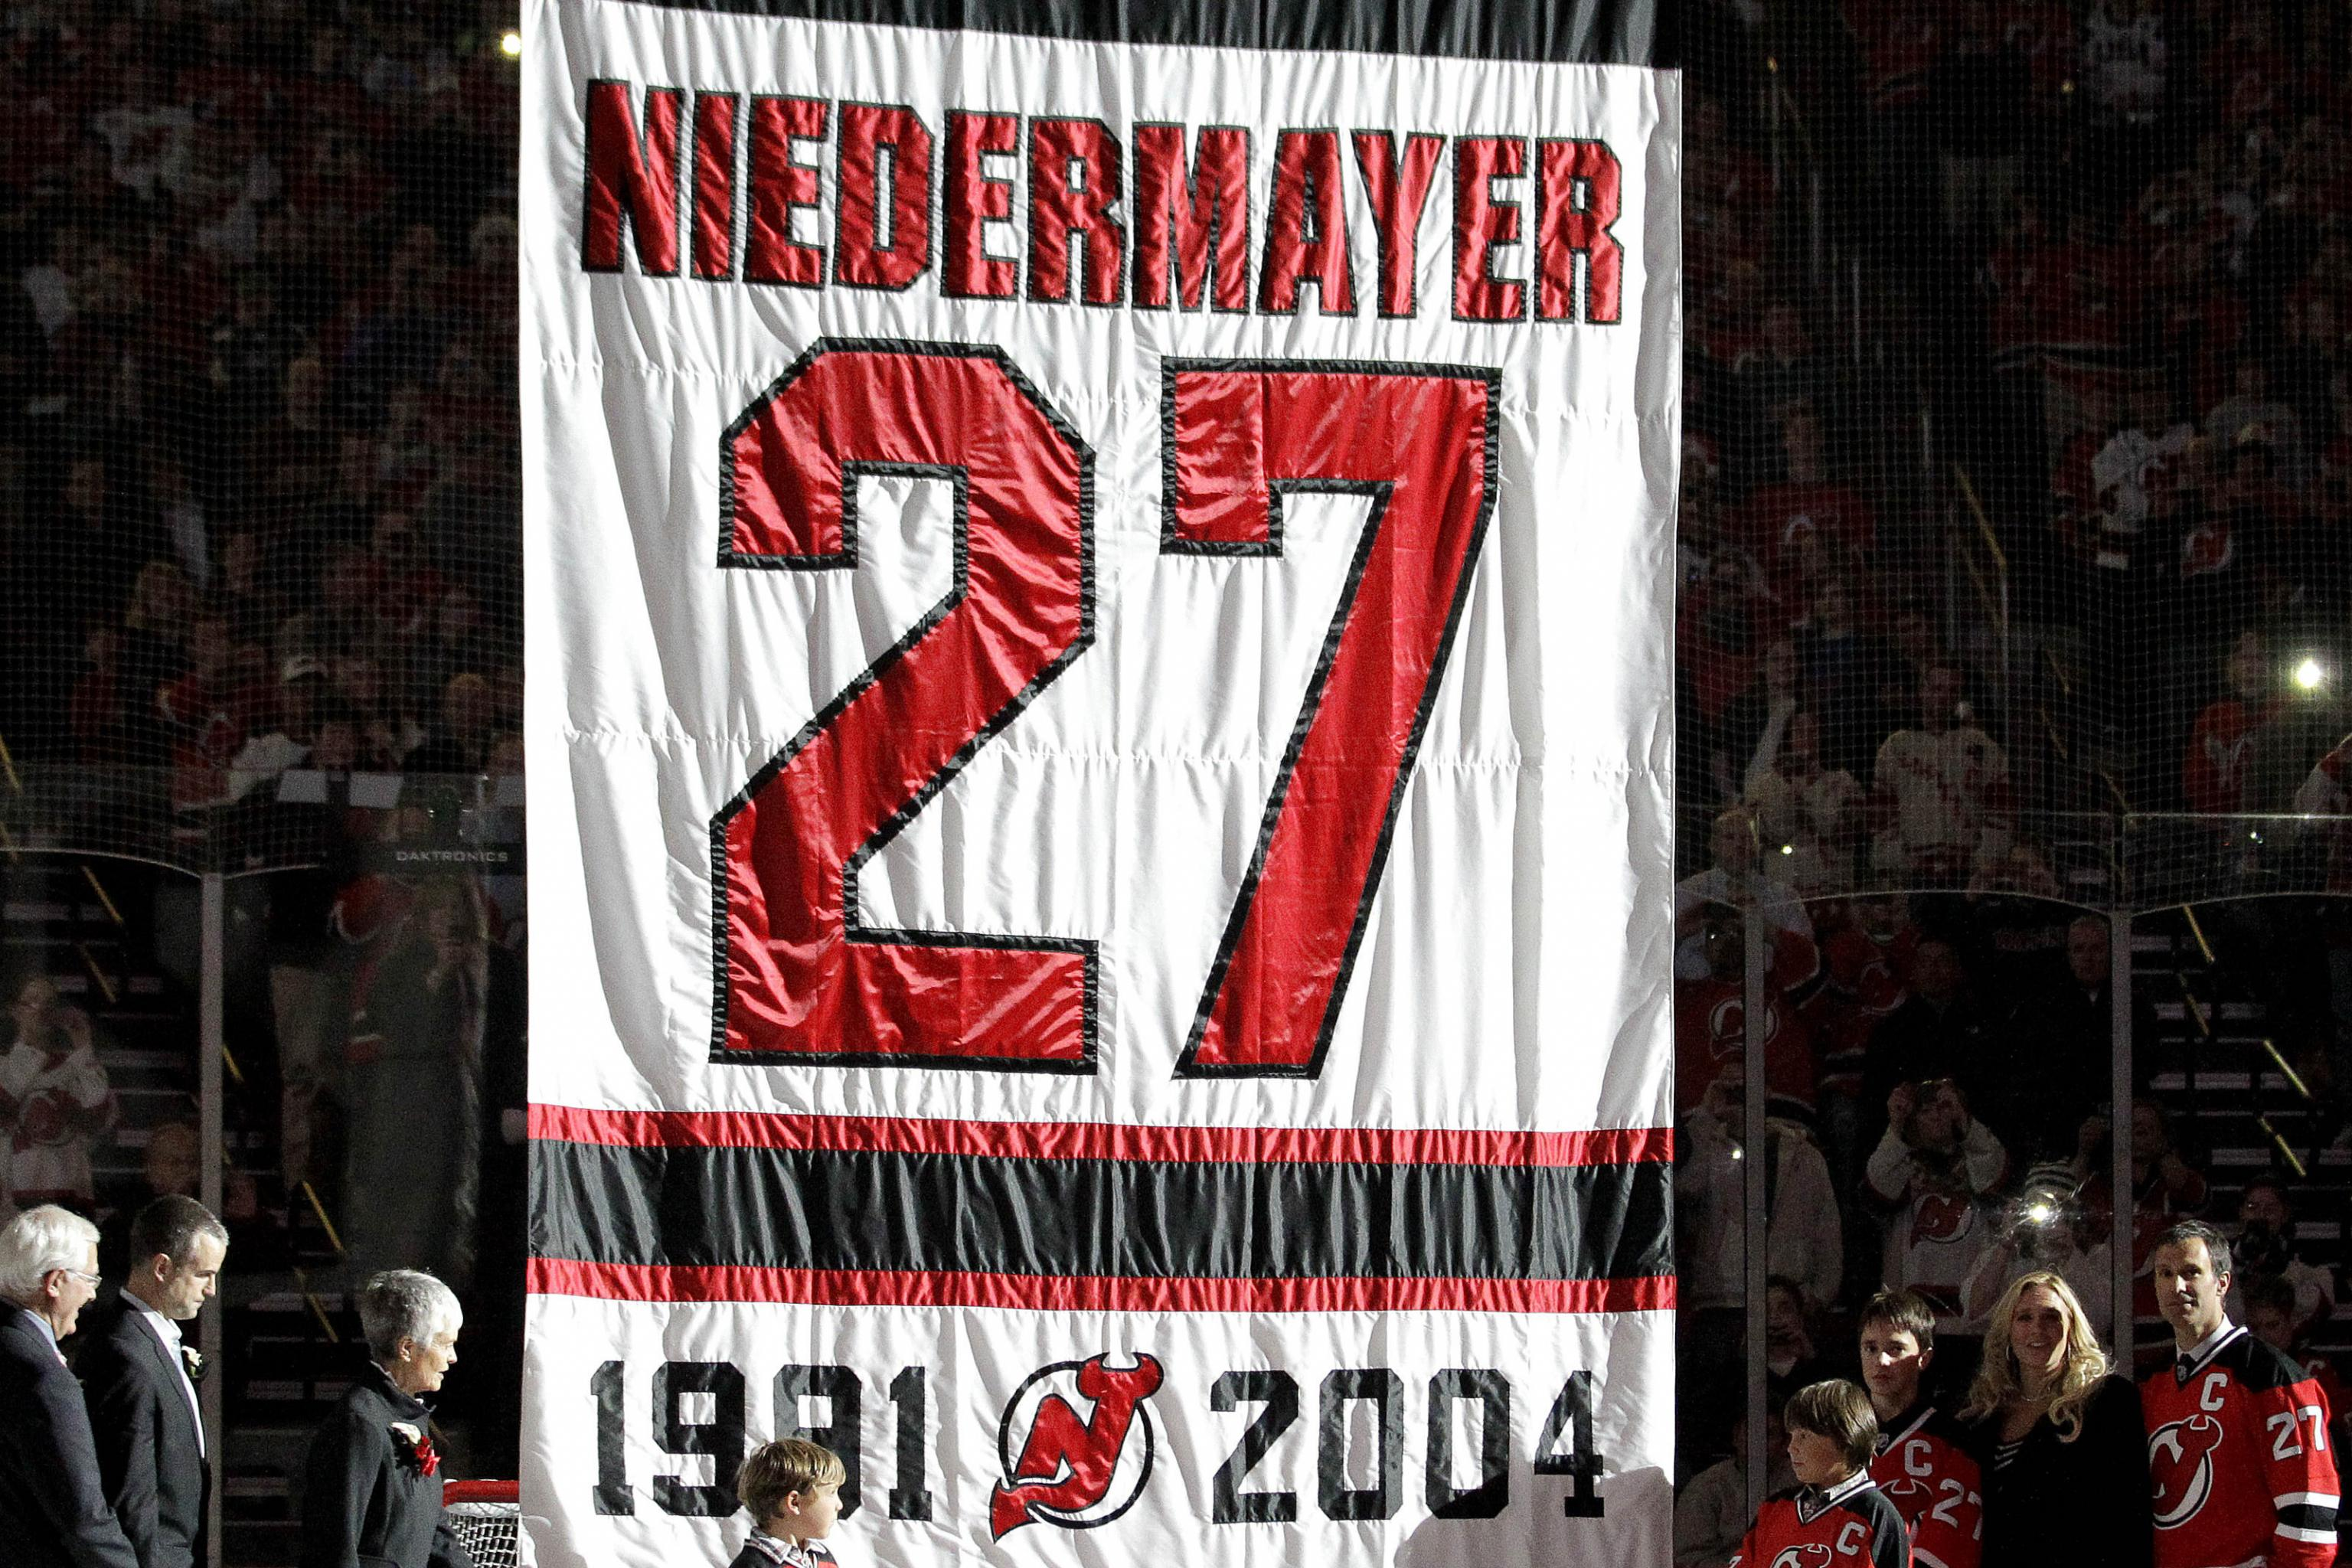 timeless design 4a8e9 b8aaa NHL: New Jersey Devils Honor Scott Niedermayer, Down Dallas ...